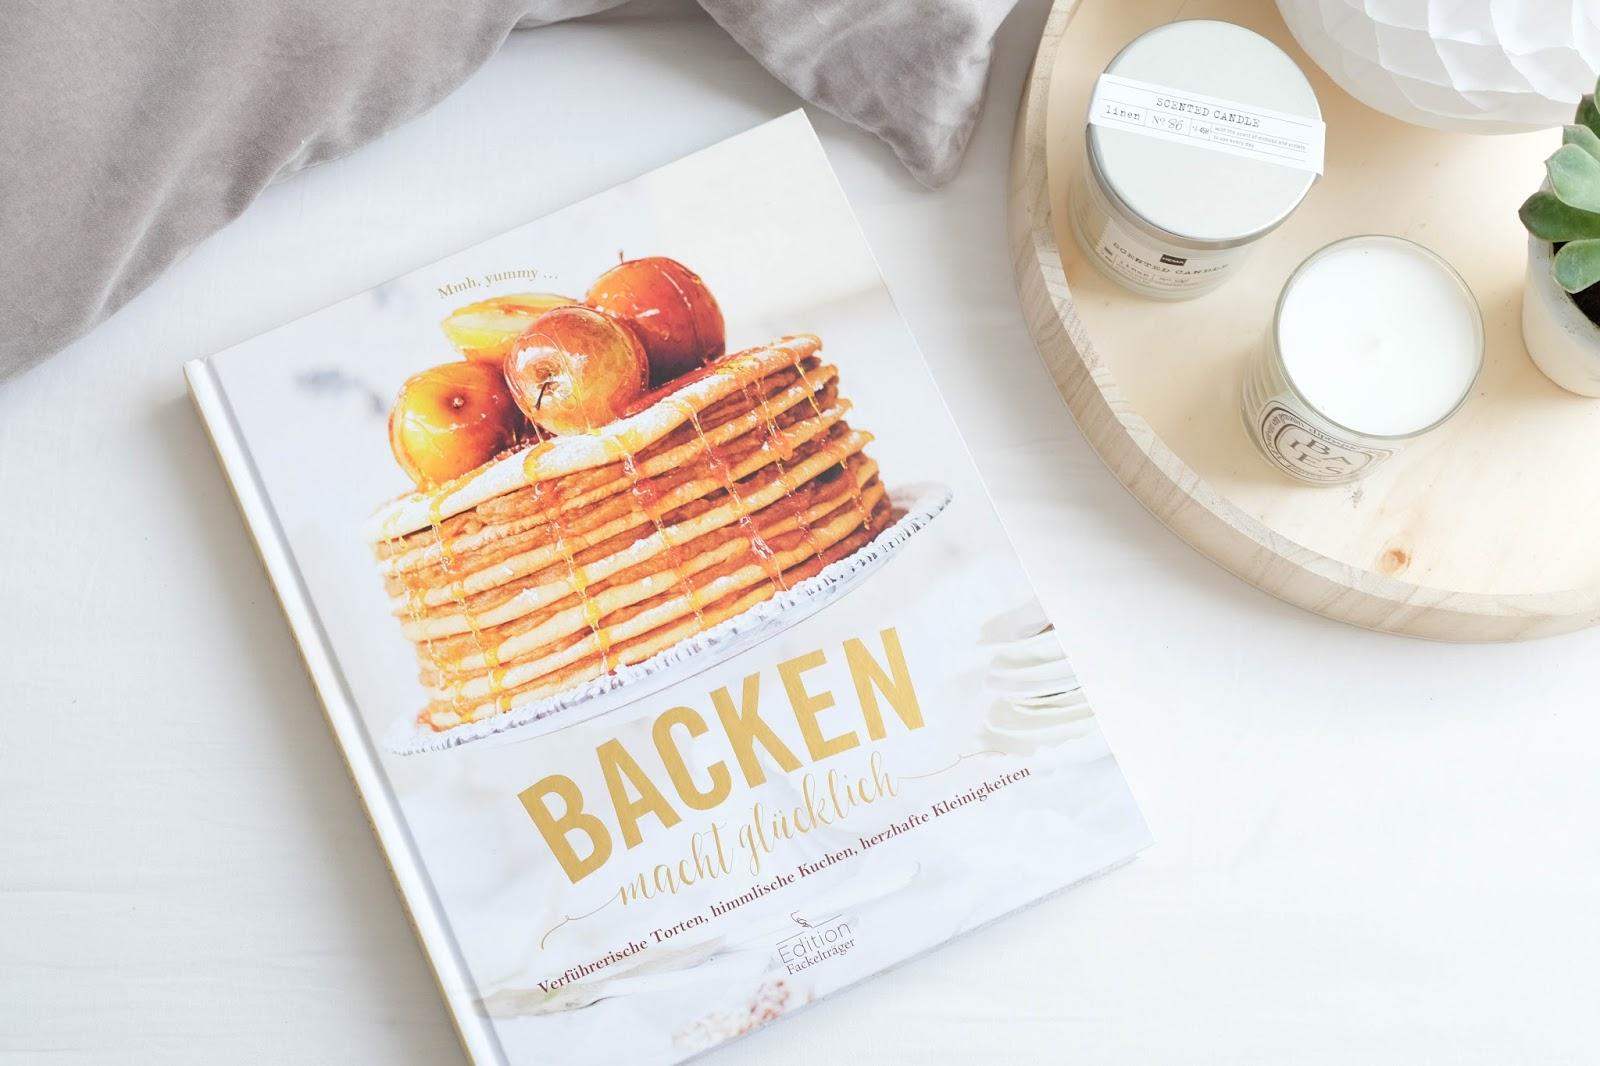 New books on the blog: Neue Koch- & Backbücher im Herbst ... | {Koch- & backbücher 56}